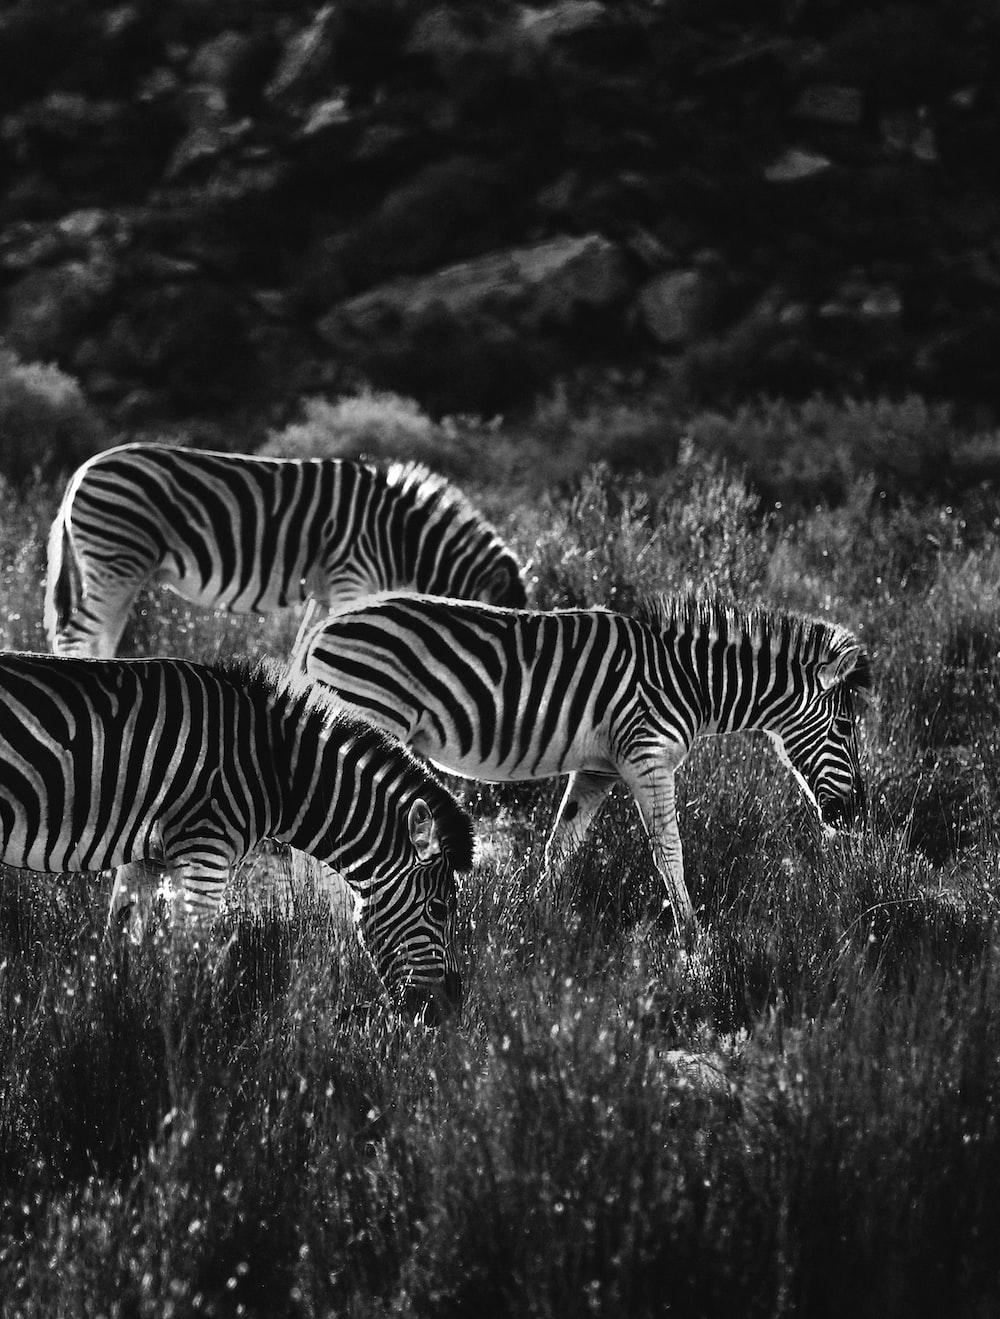 grayscale photo of zebra on grass field